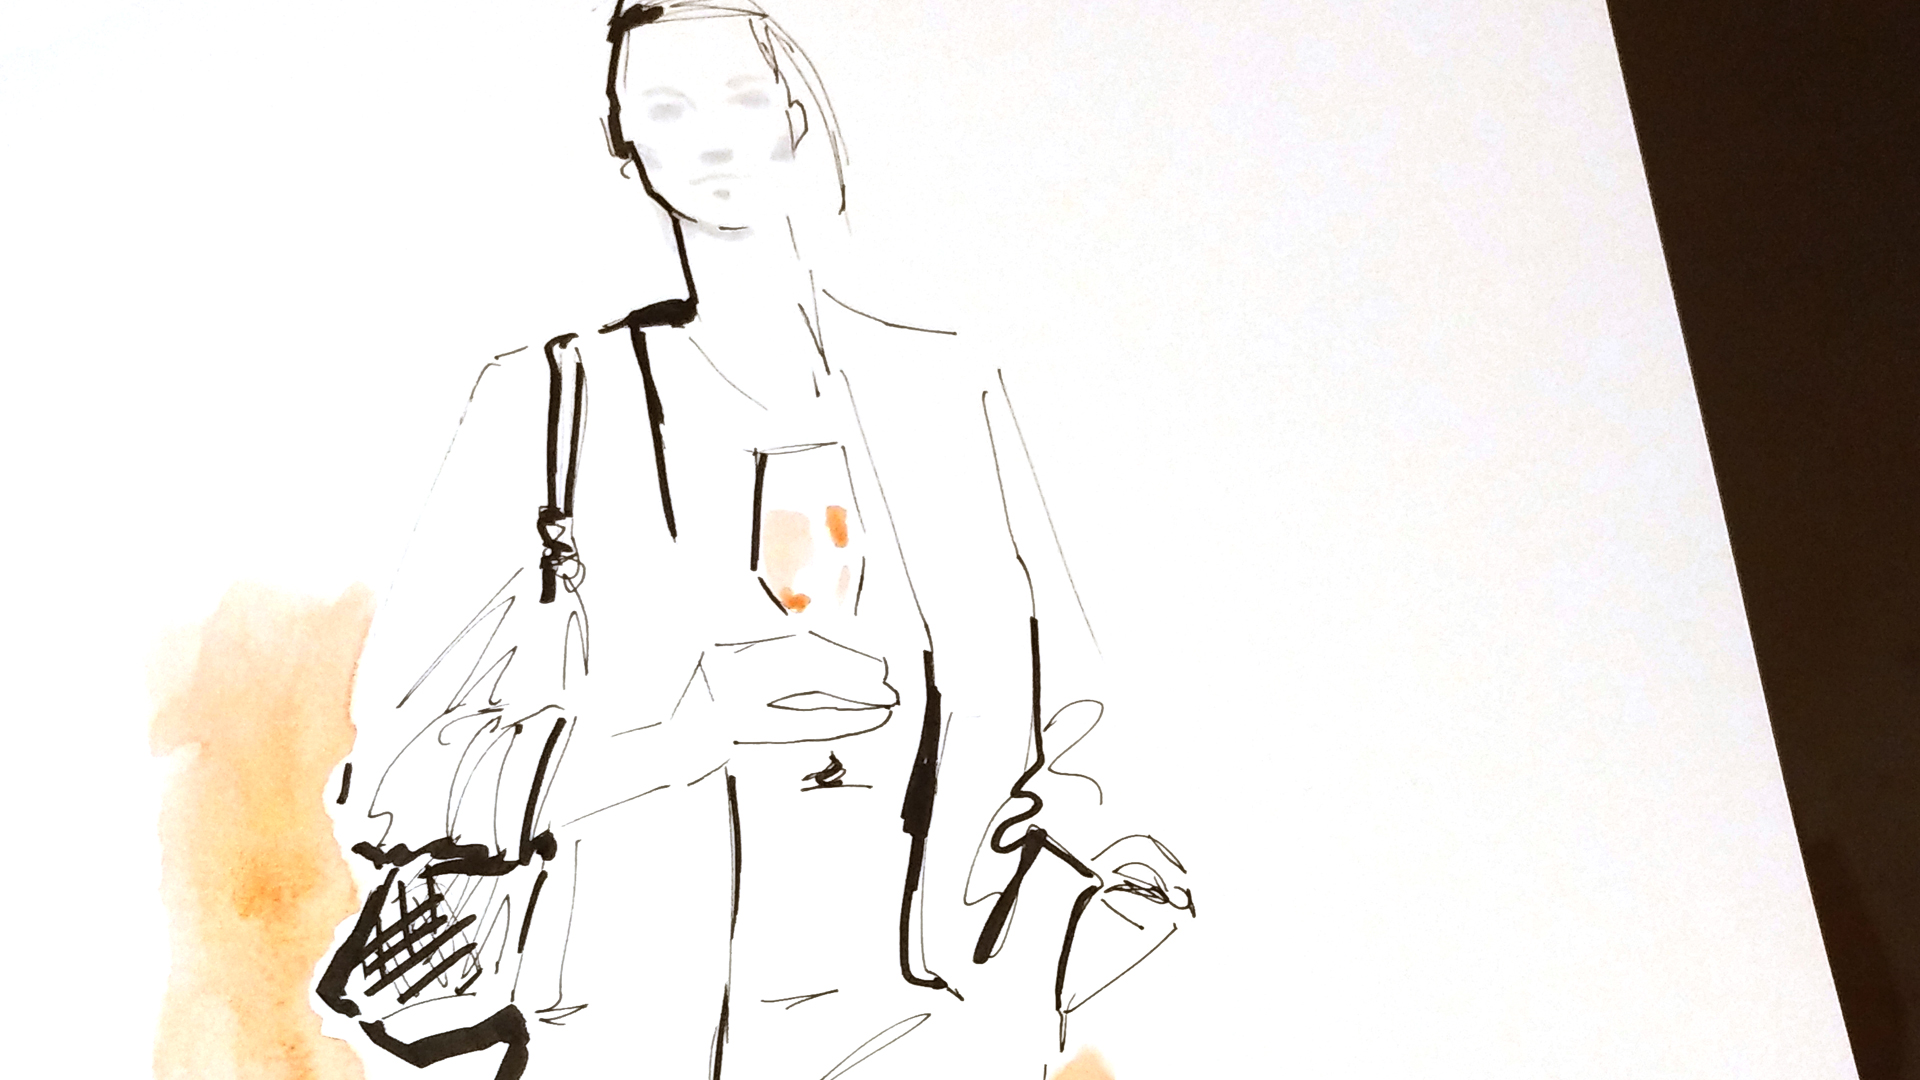 Live-Sketching-Fashion-Illustration-Event-Lillet-Virginia-Romo-11.jpg